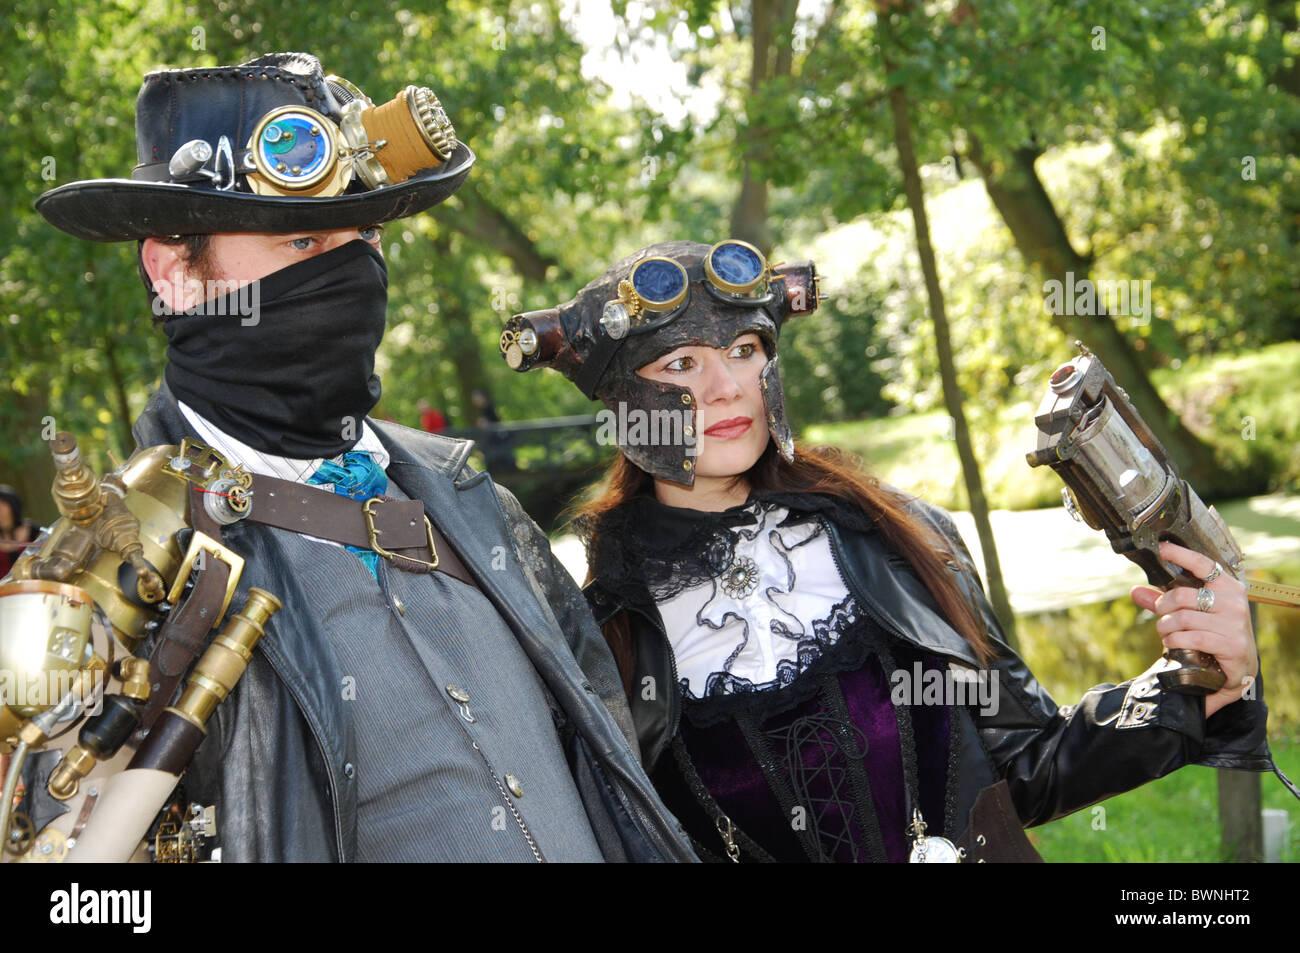 steampunk couple at 2010 Fantasy Fair Arcen Netherlands - Stock Image